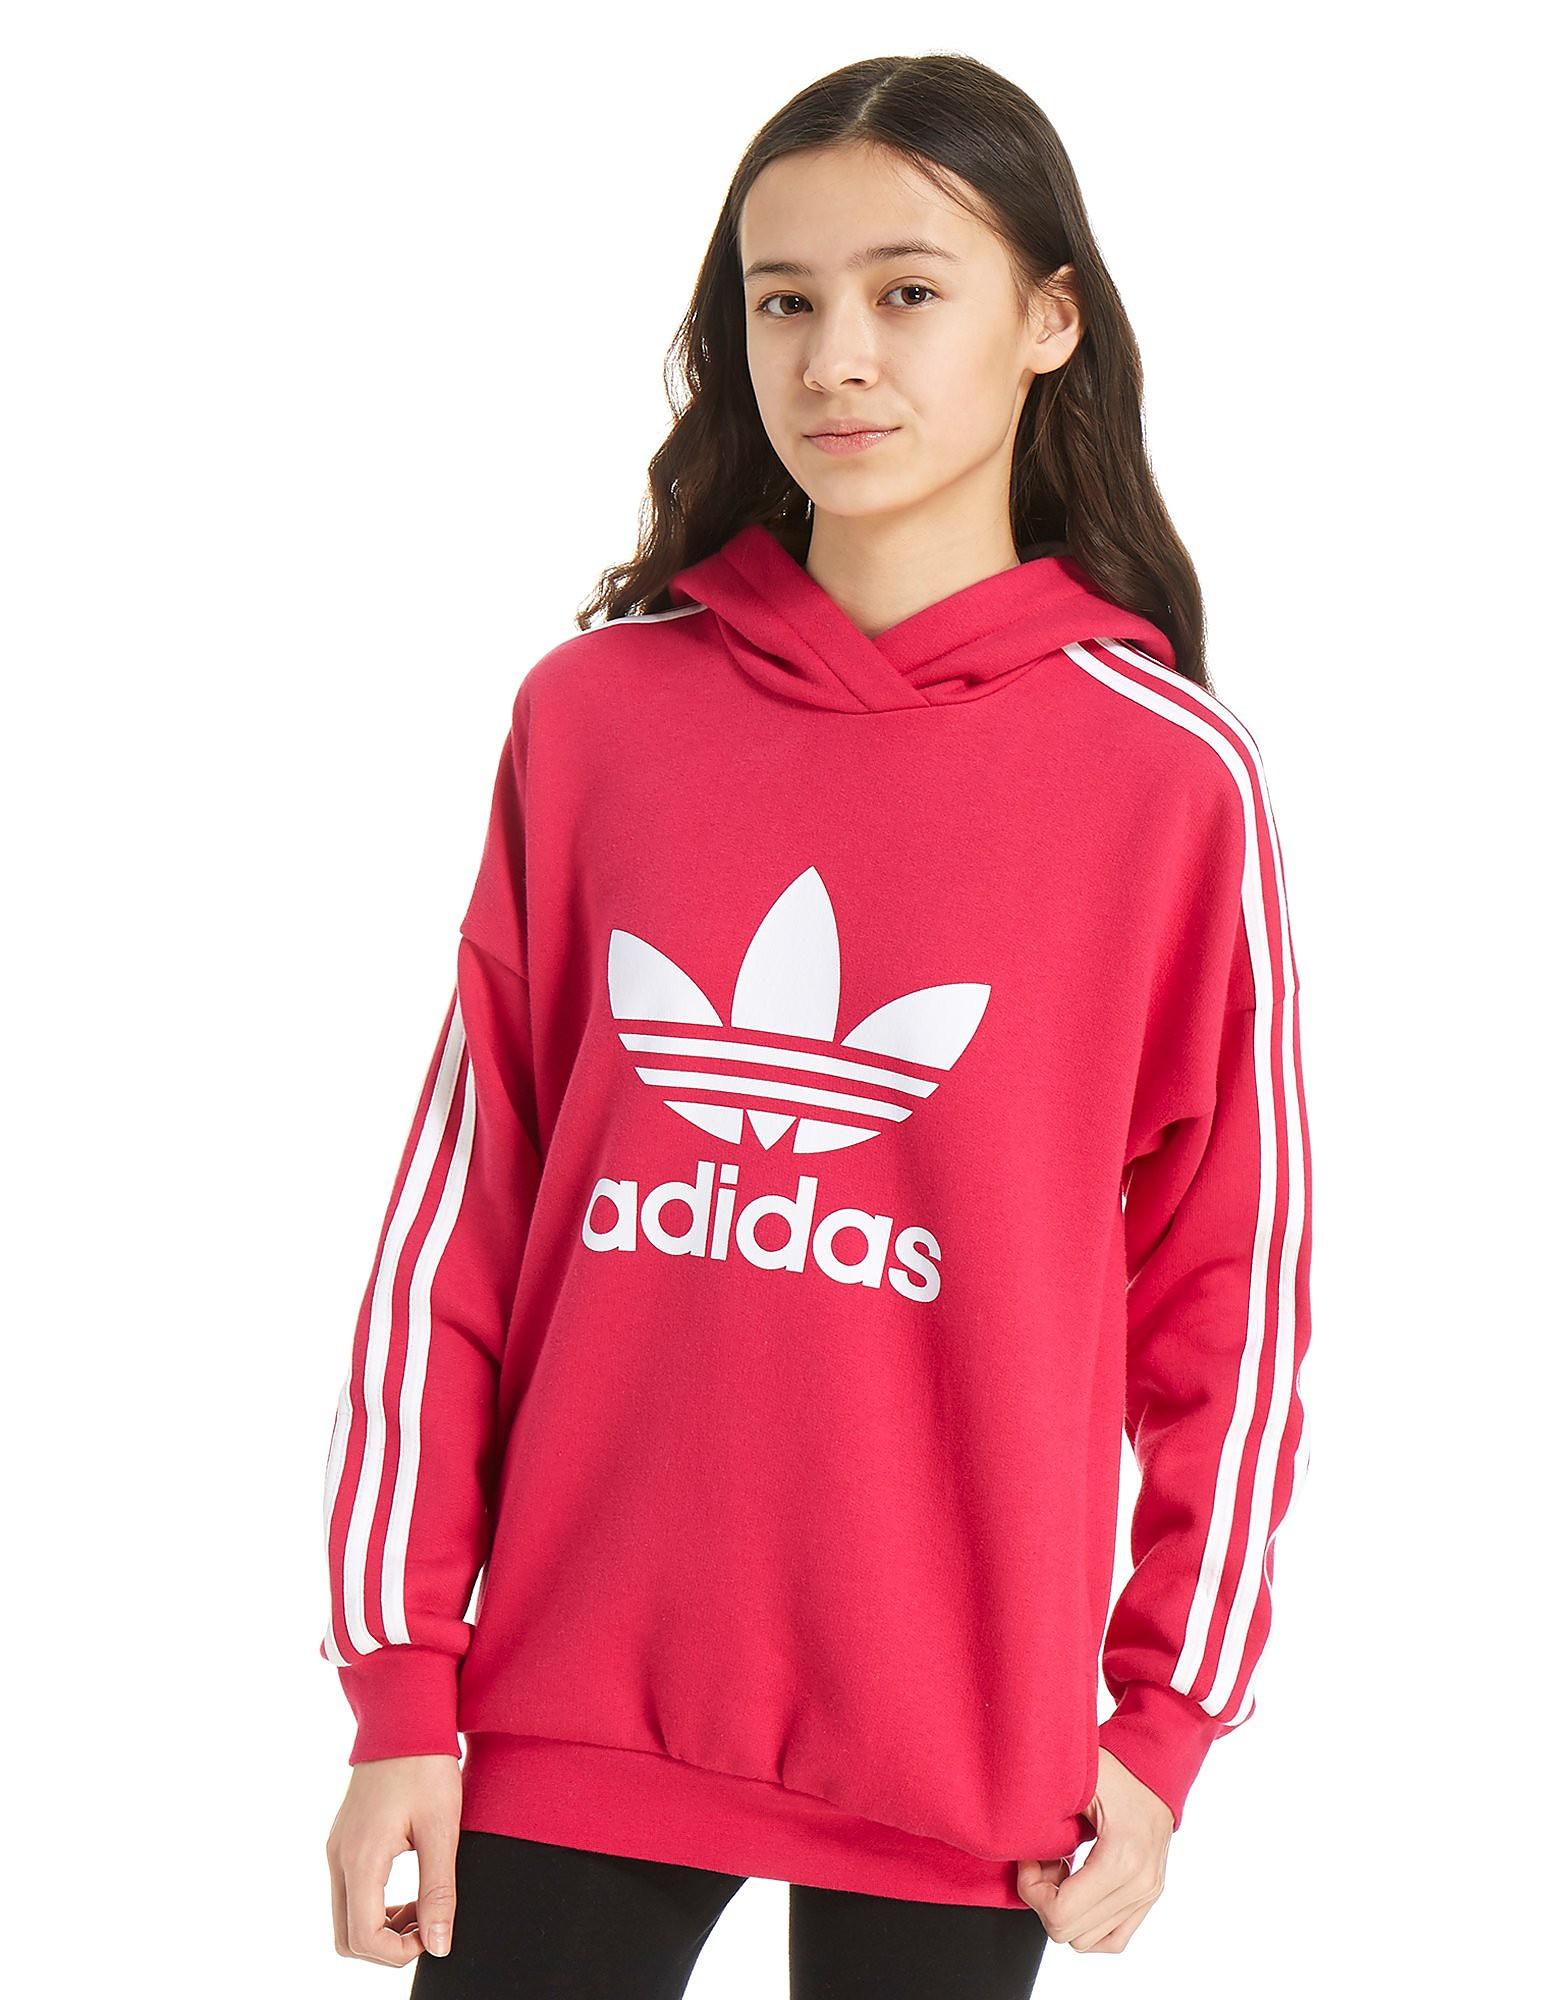 adidas Originals Girls' Trefoil Overhead Hoody Junior